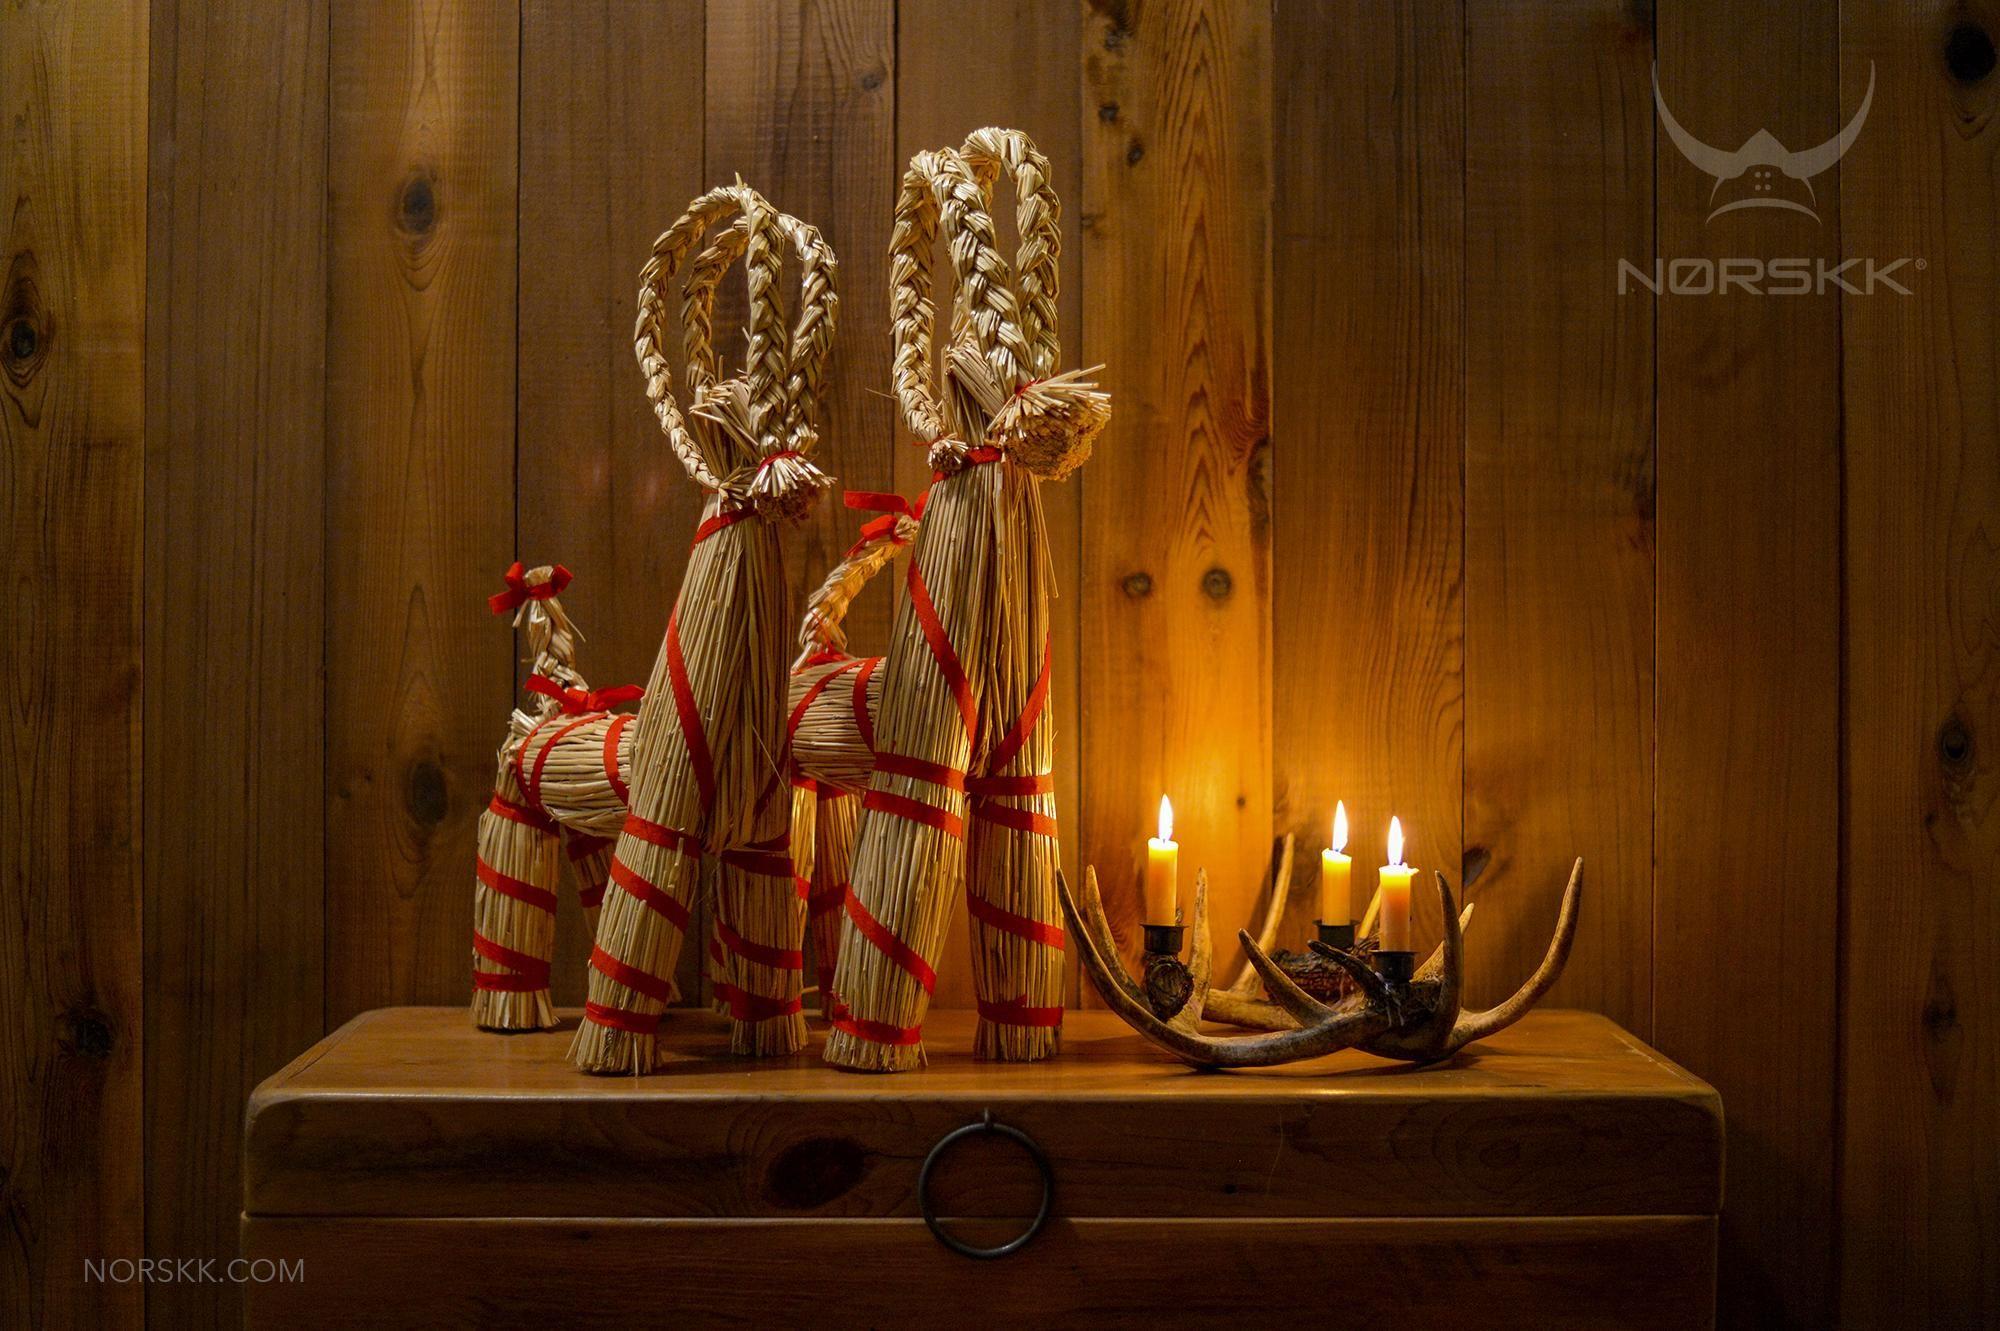 Julebukk: Norse Yule Goat Julebukk (Yule goat) is a Norse Yule ...